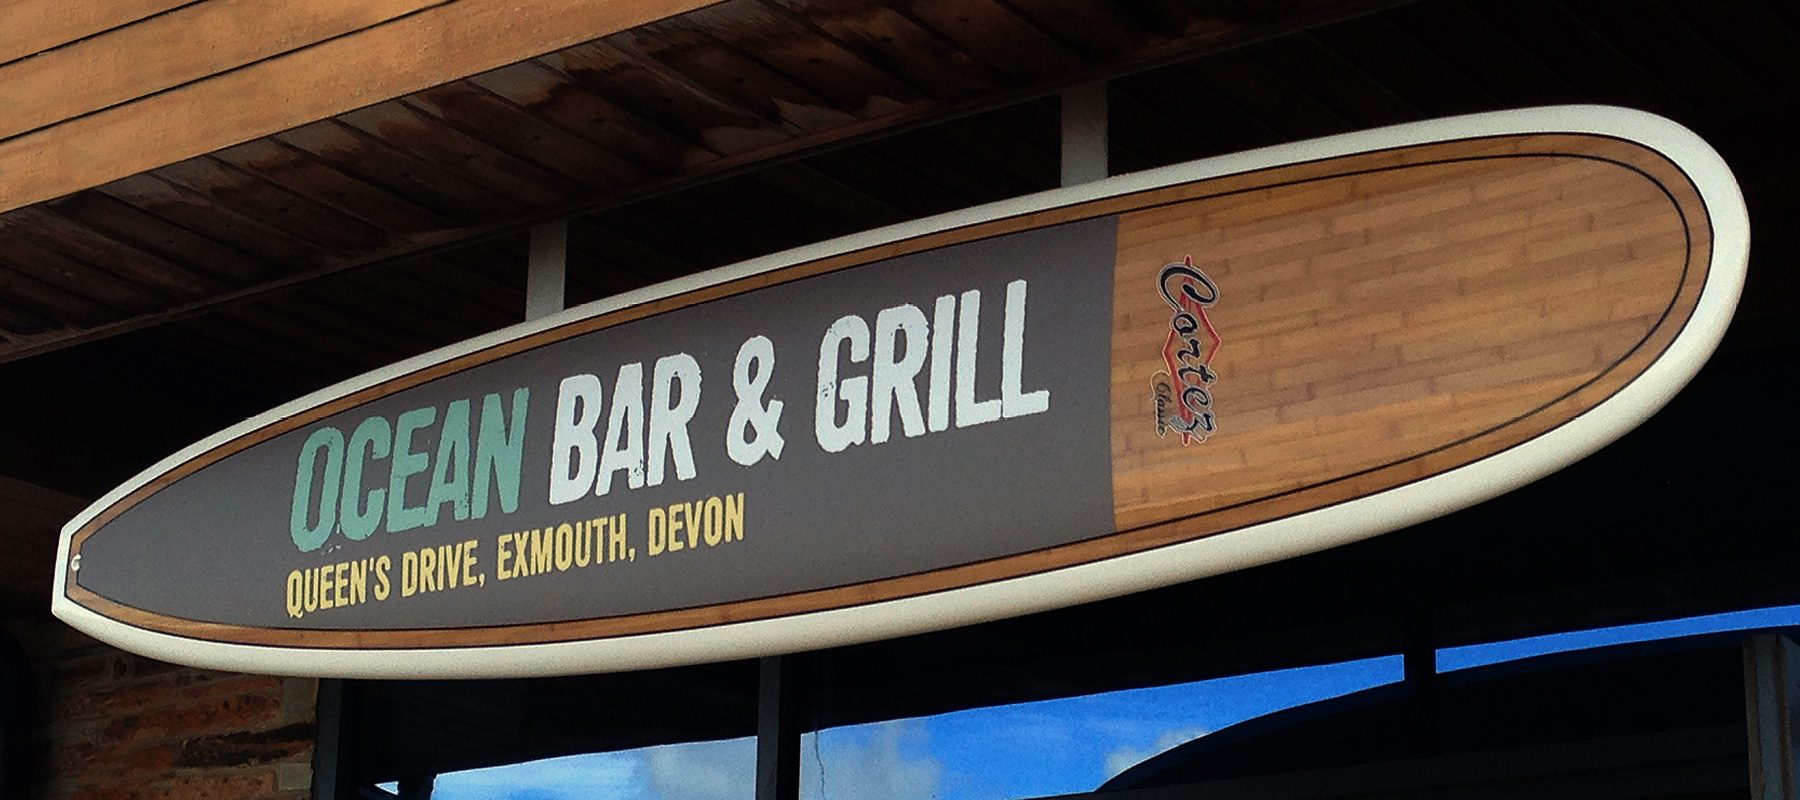 ocean exmouth logo brand design bar grill restaurant surfing retro